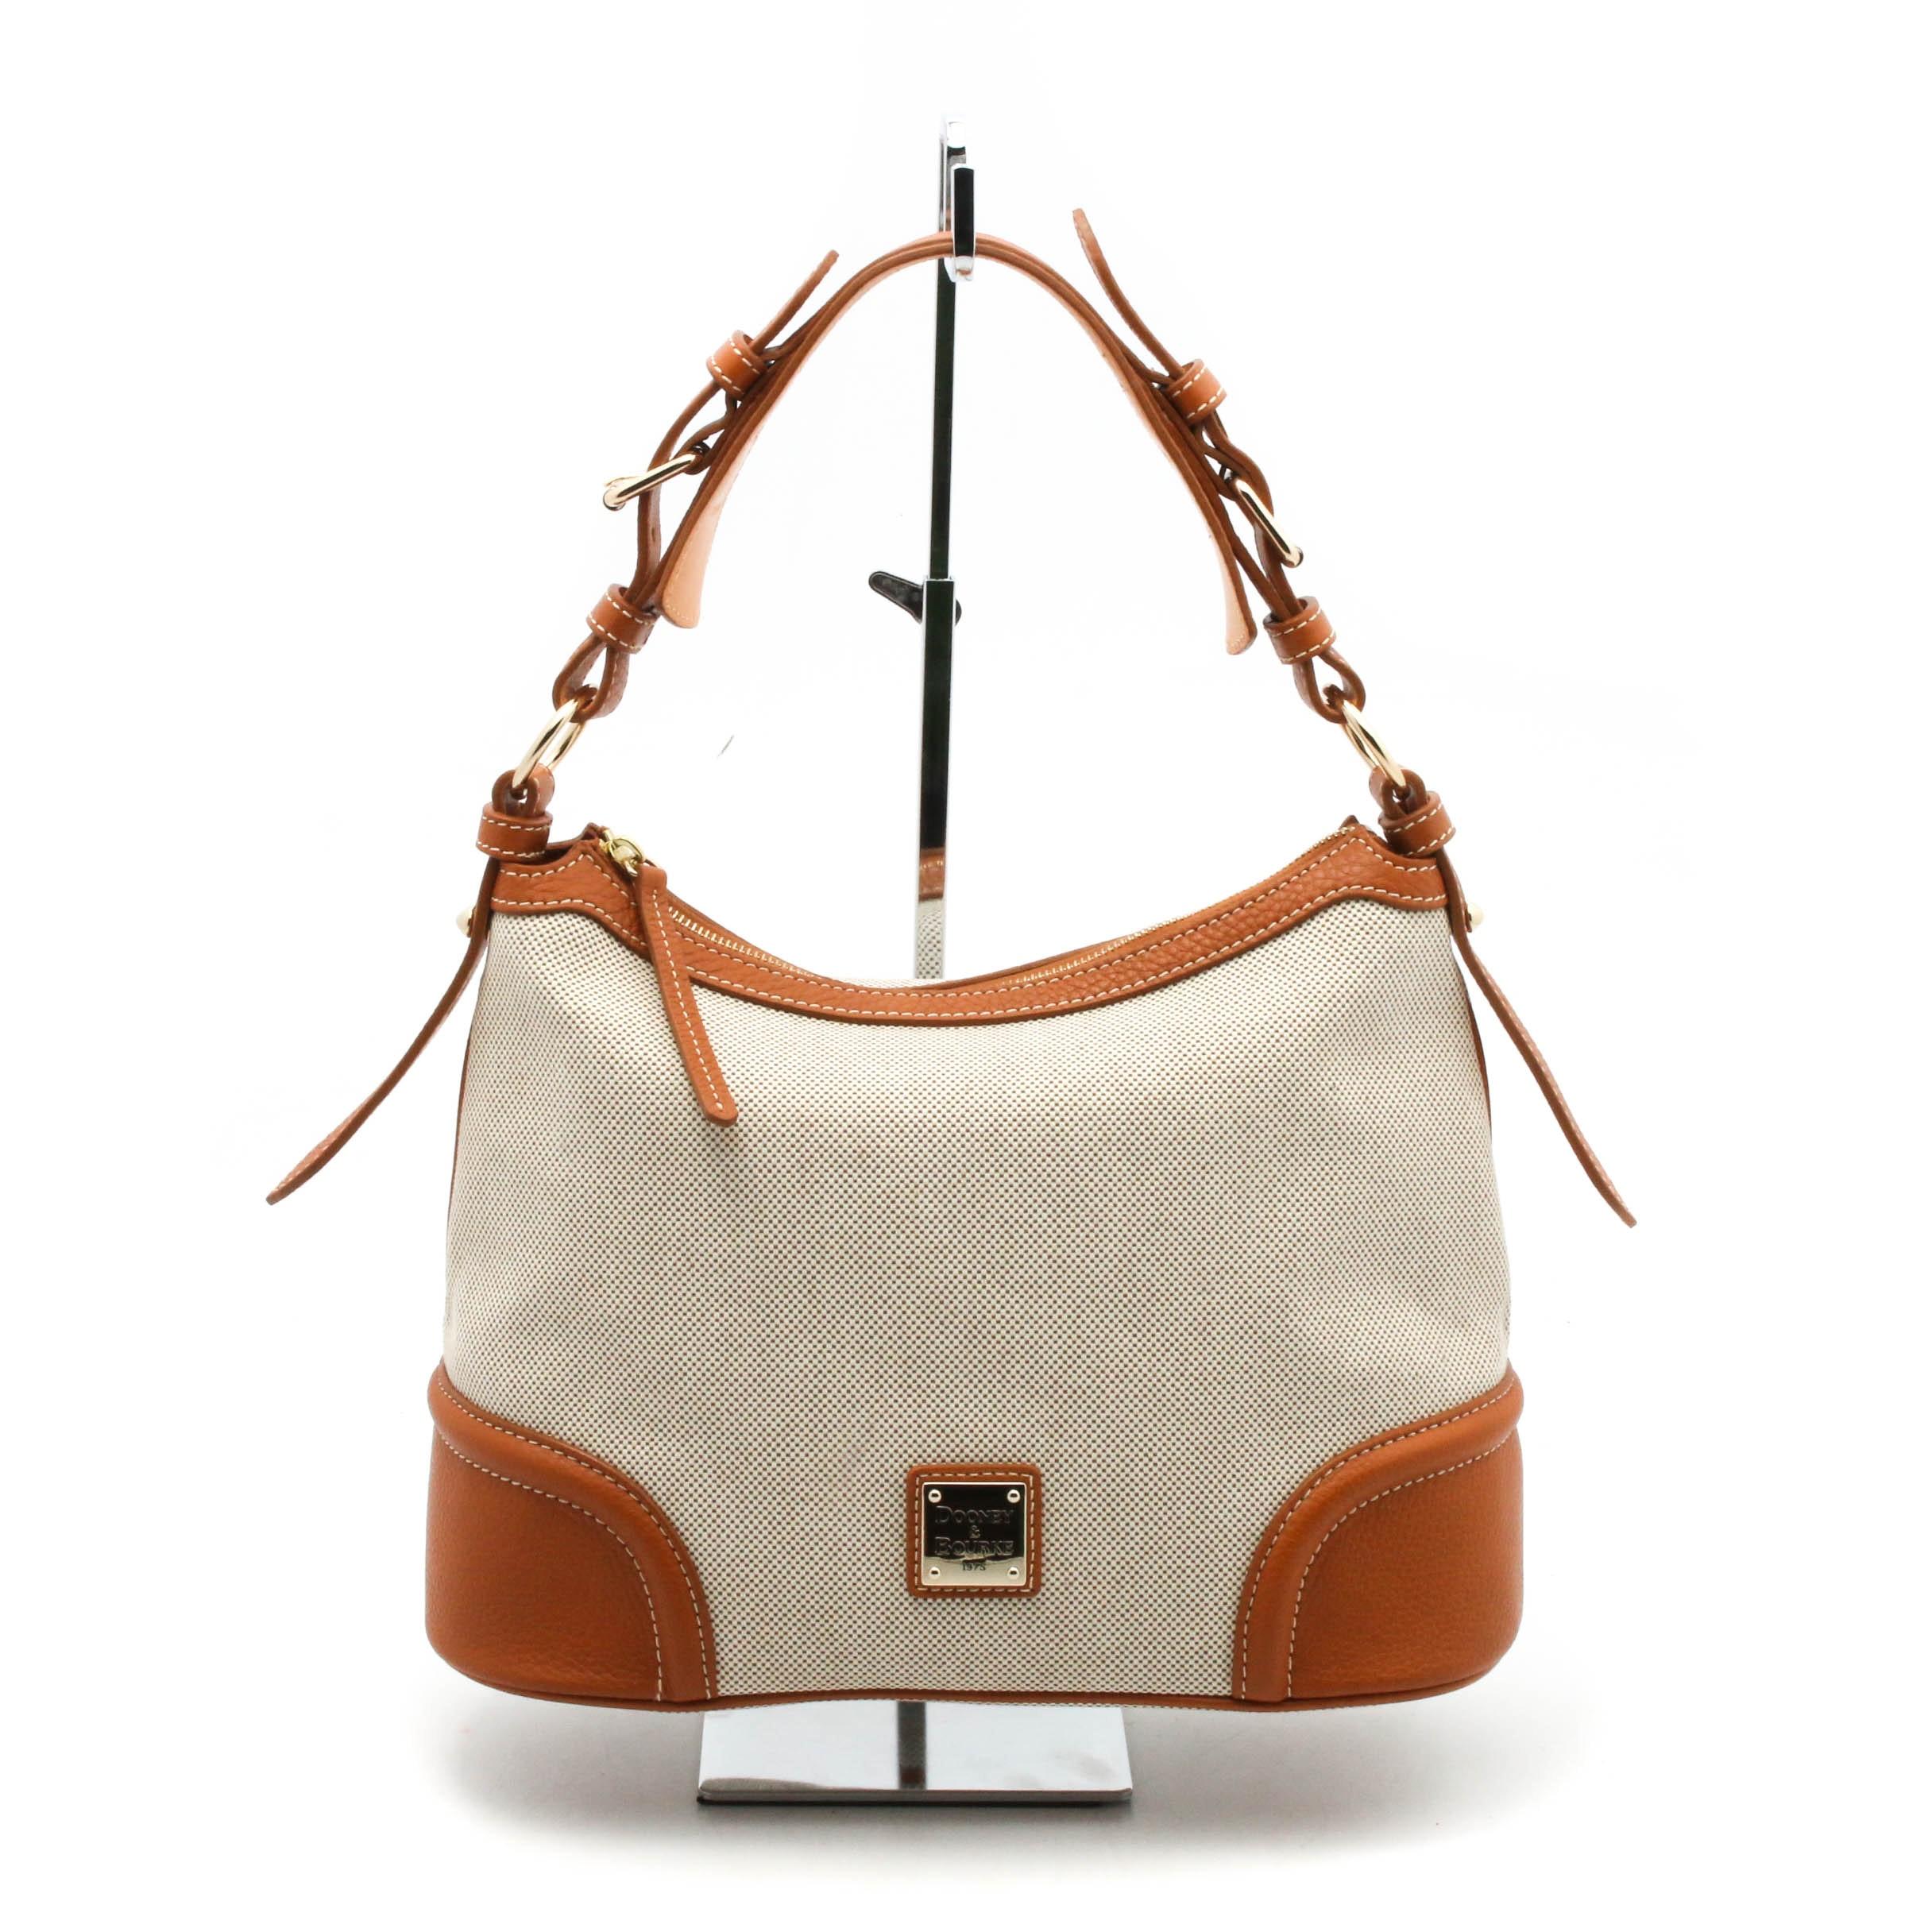 Dooney & Bourke Canvas and Leather Hobo Handbag